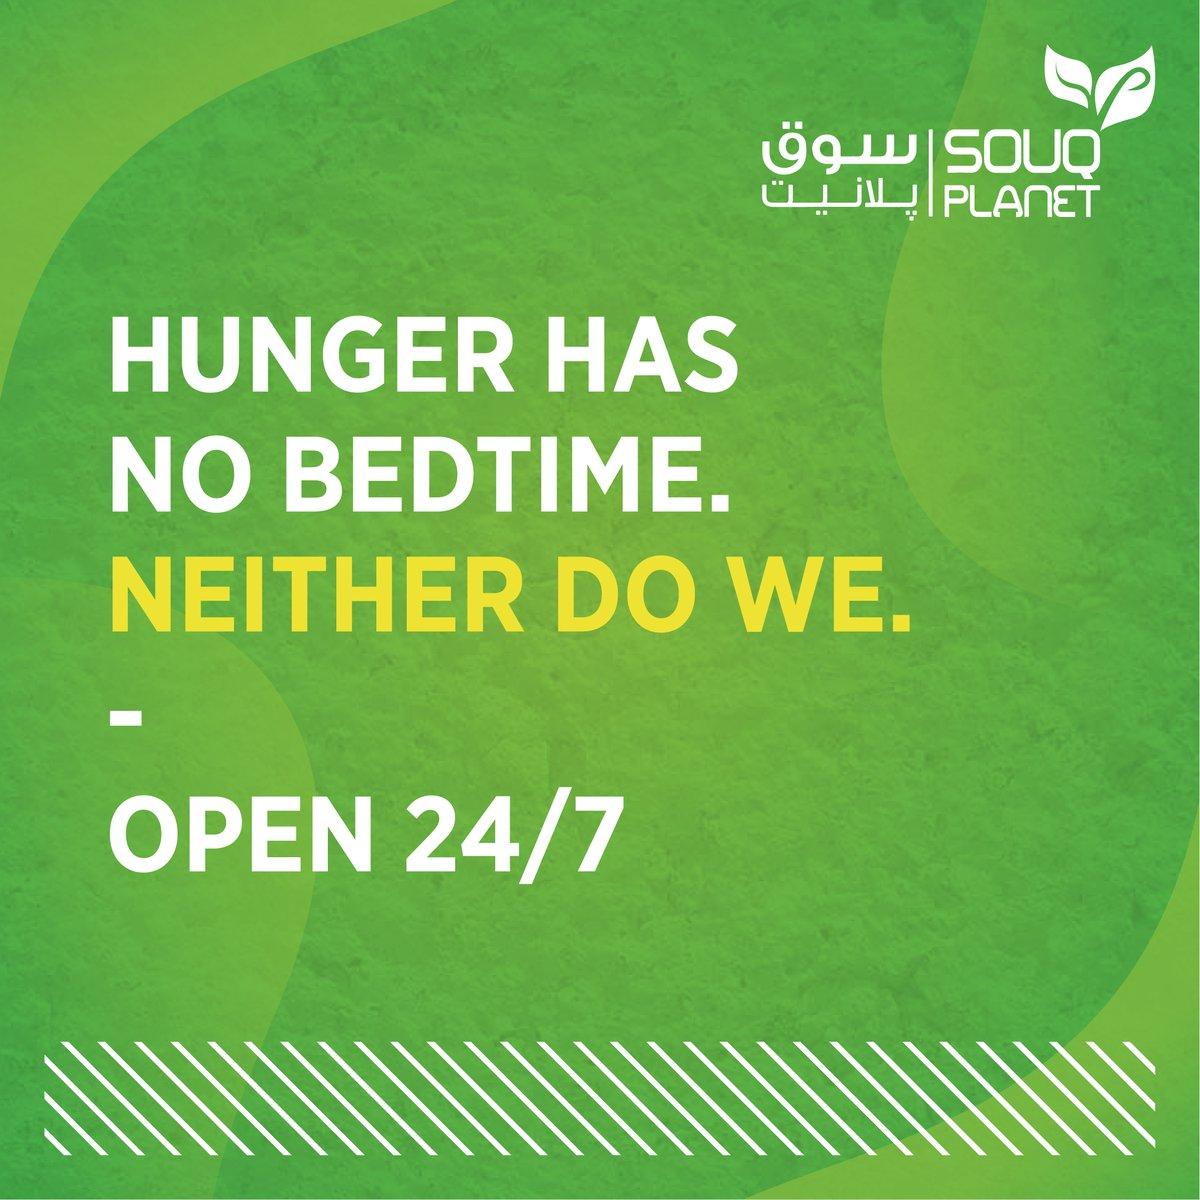 Open 24/7 🌱 💚   #souqplanet #smartshopper #onlineshopping #groceryshopping #inabudhabi #dubai #alain #uae #vegan #madinatzayed #safeplanet #stayhome #socialdistancing https://t.co/2QRFBfd6iH